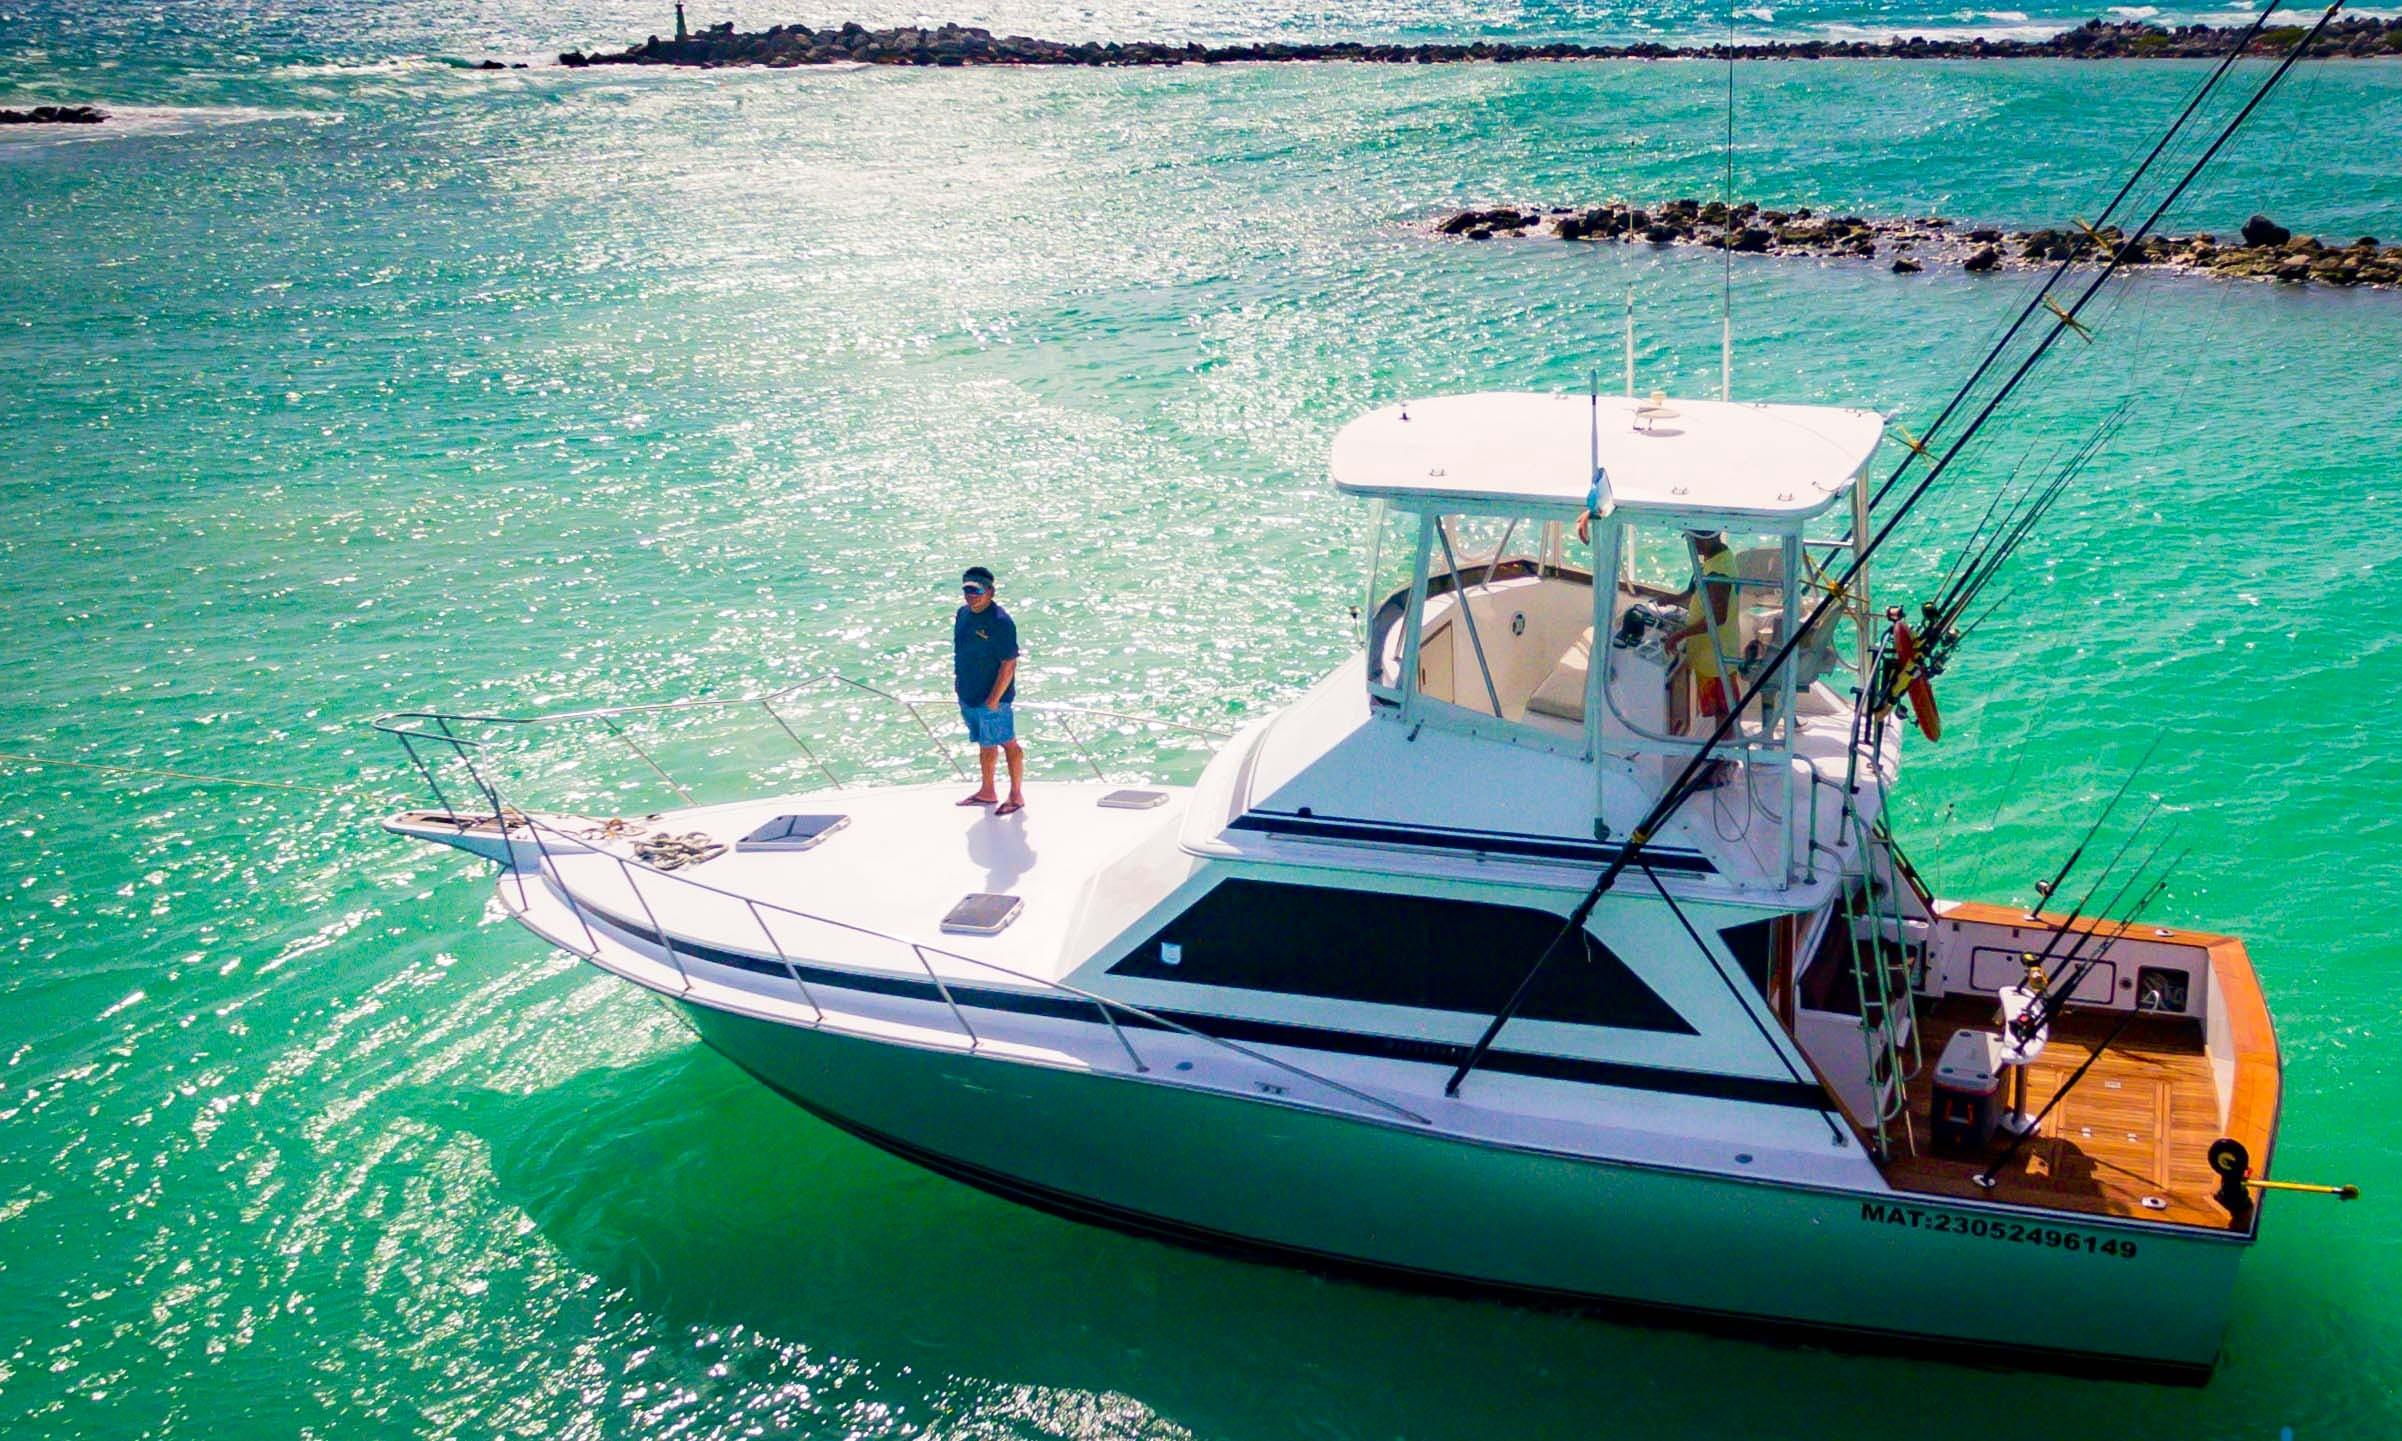 38' Dawson Sportfishing Charter in Playa del Carmen